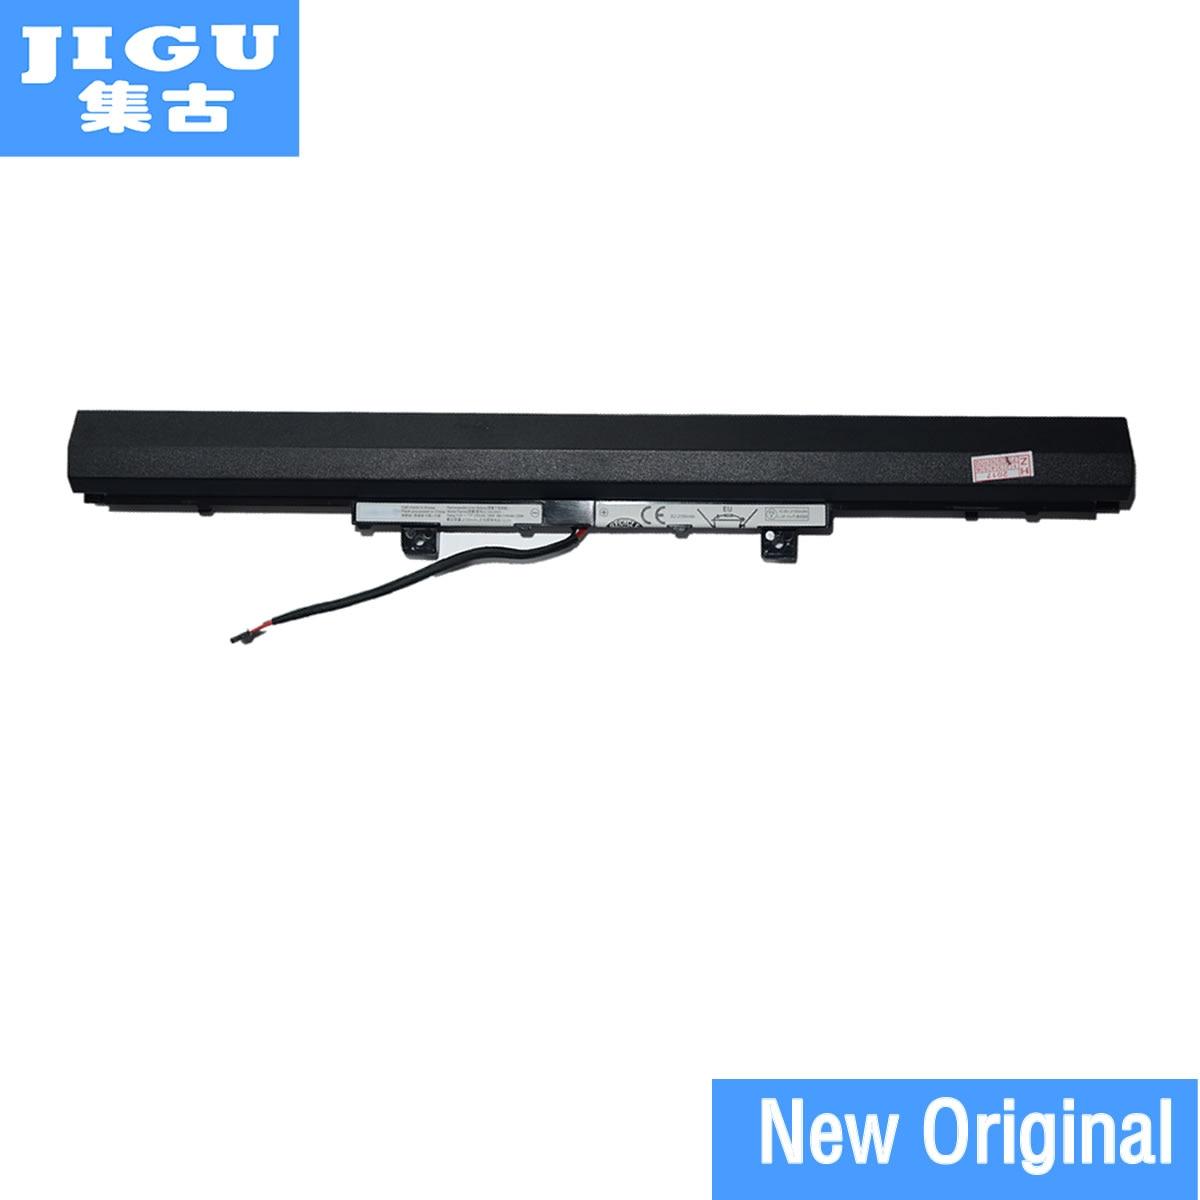 JIGU Original ordenador portátil batería L15C3A01 L15C4A02 para LENOVO Ideapad 110-15 V110-15AST V110-15IAP V110-15ISK